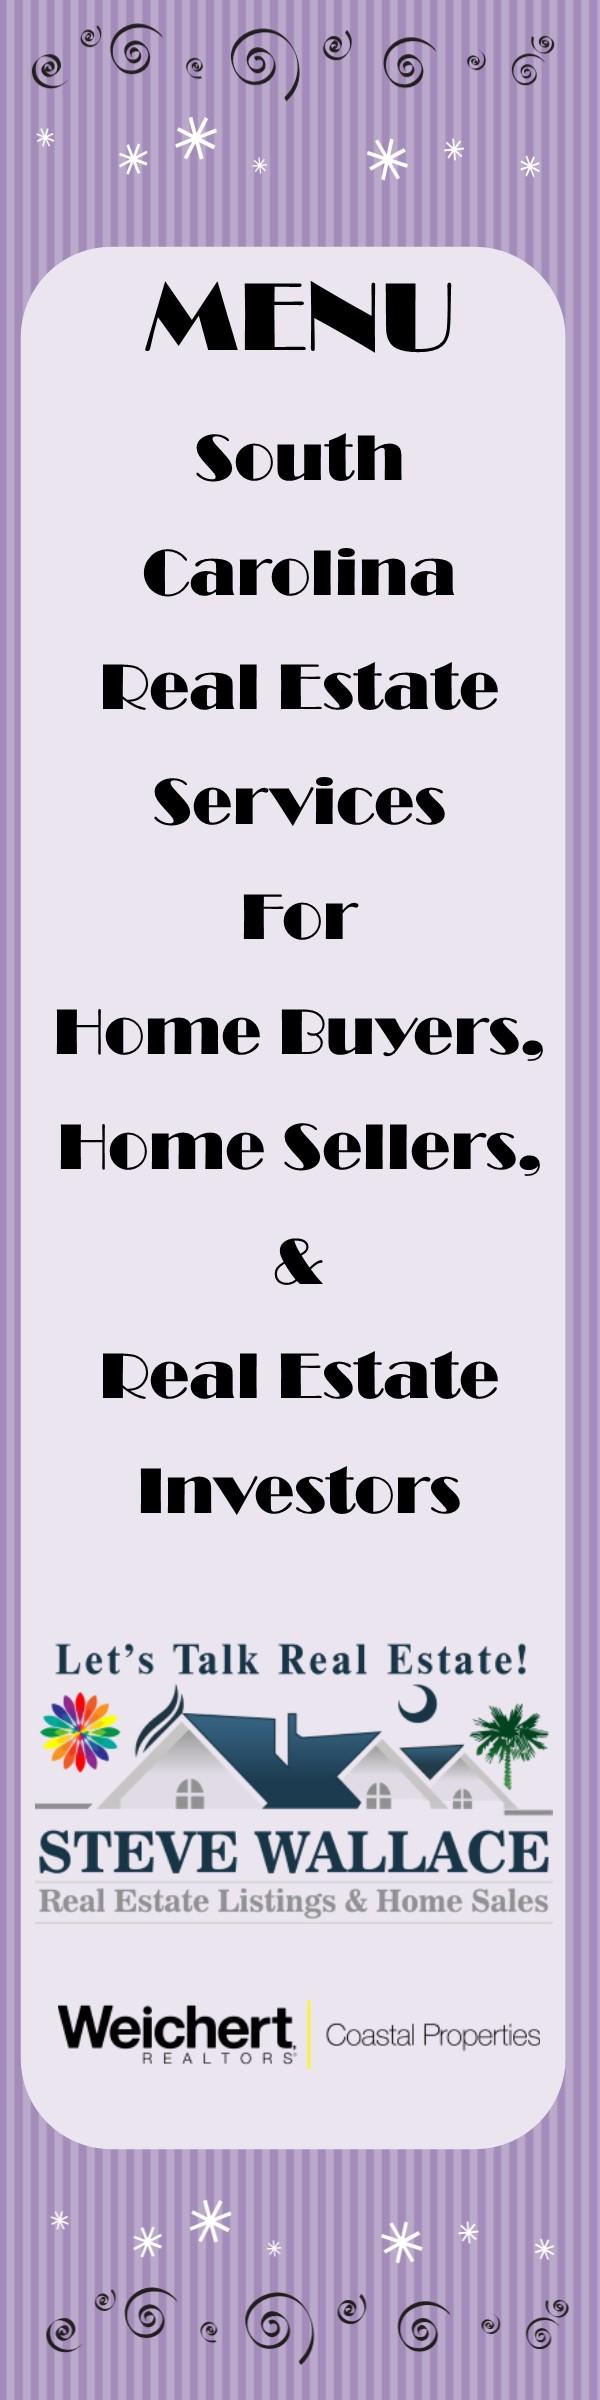 South Carolina, Menu, Real Estate, Bluffton, Sun City, Hilton Head, Realty, Menus